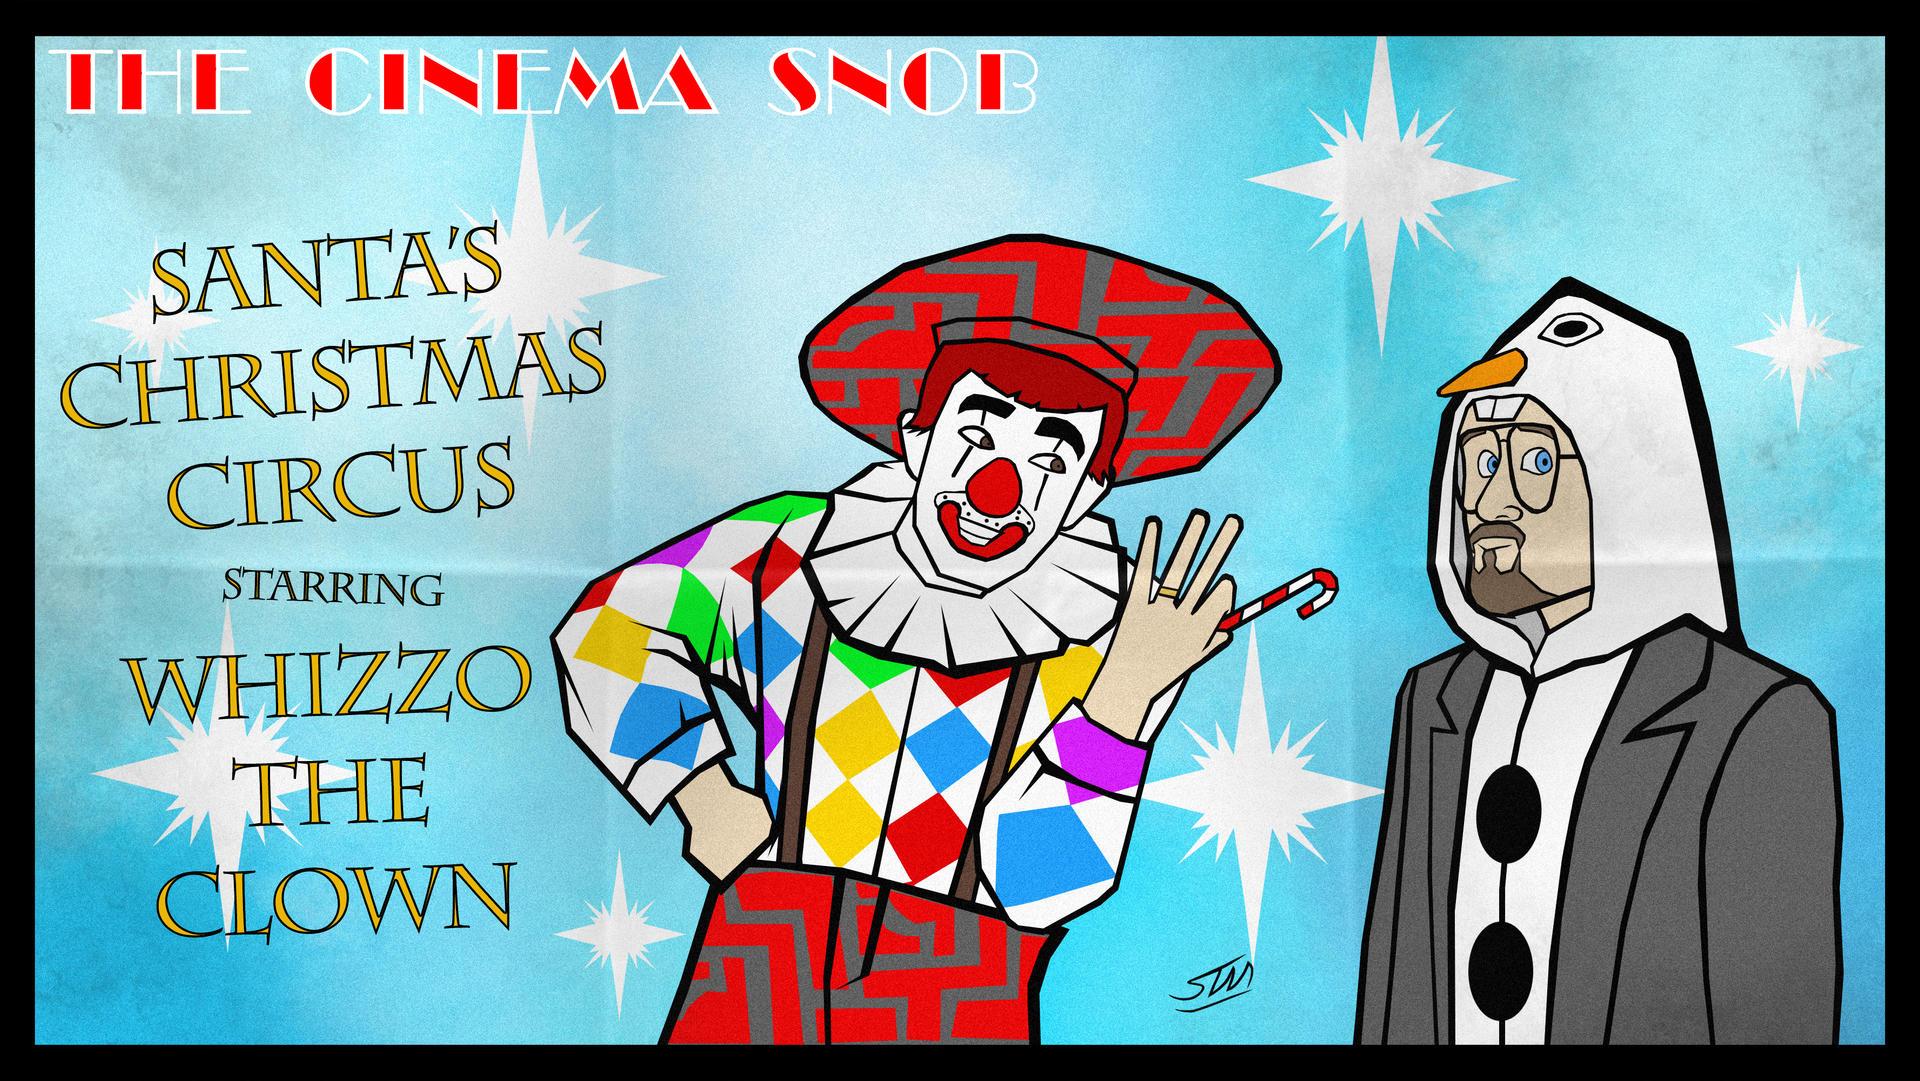 Santa's Christmas Circus Starring Whizzo the Clown